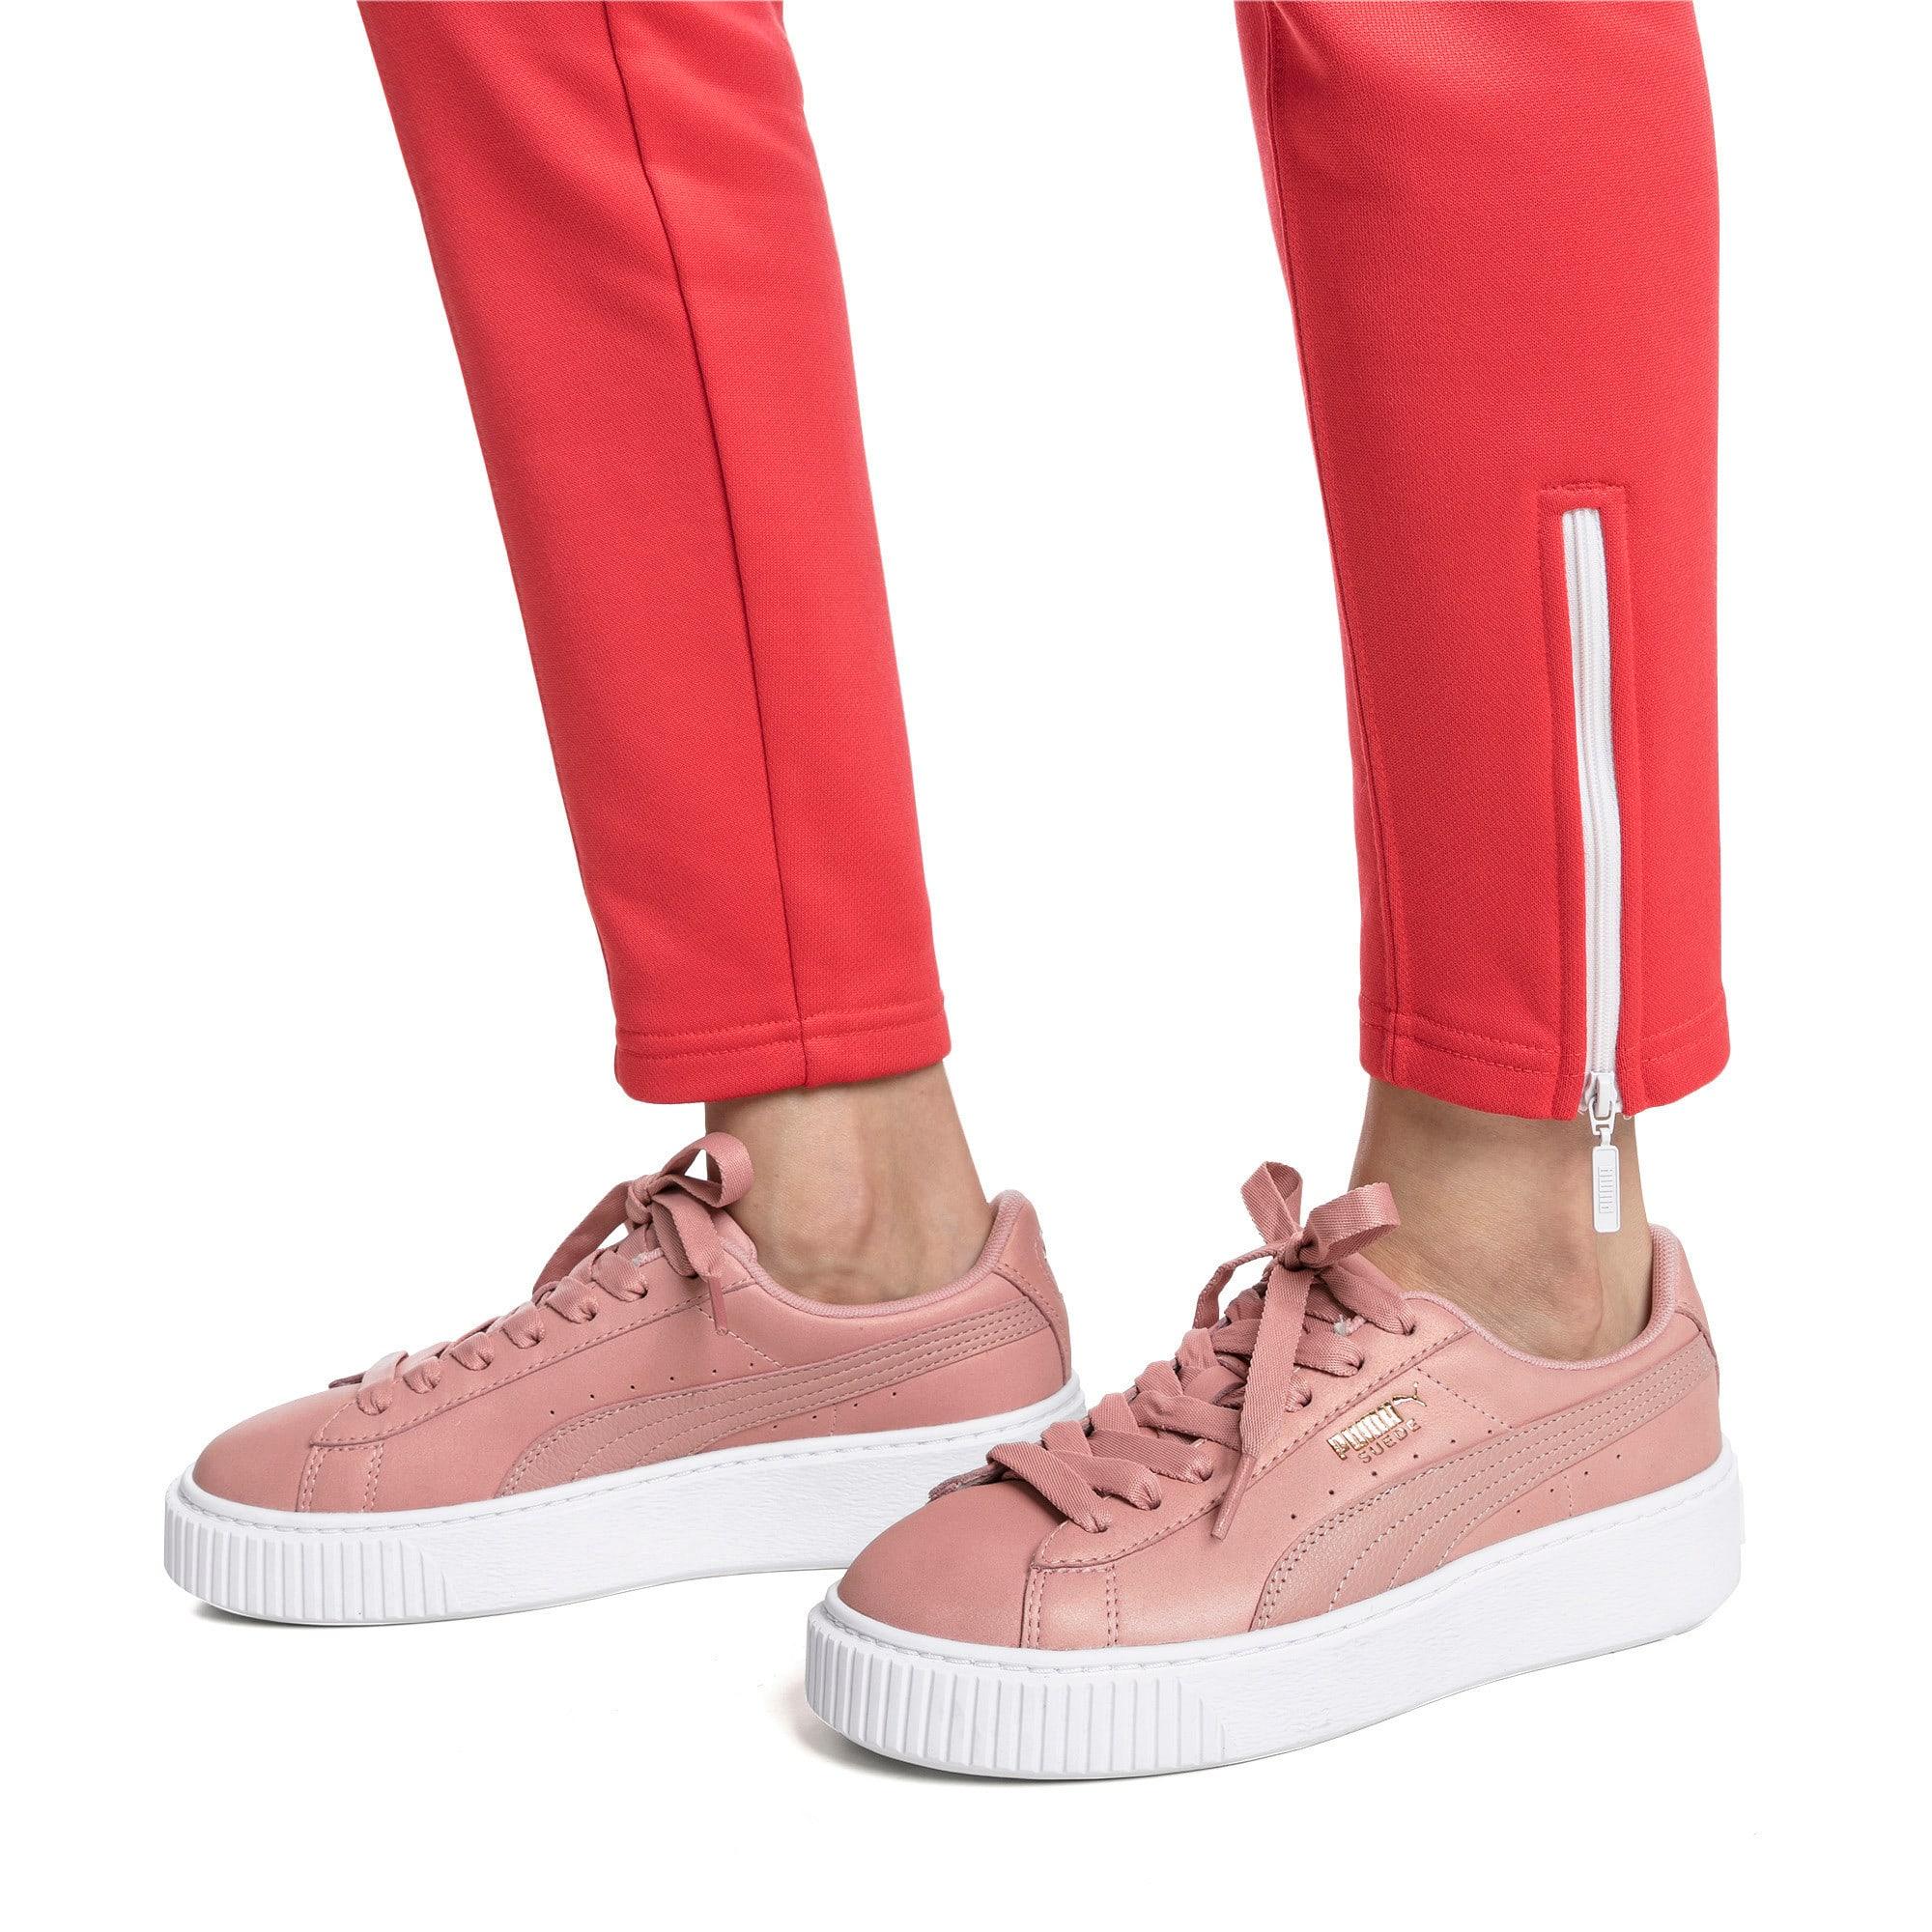 Damen Shimmer Damen Shimmer Platform Sneaker Platform Sneaker Sneaker Damen Platform Shimmer Damen Shimmer Platform K1JcFTl